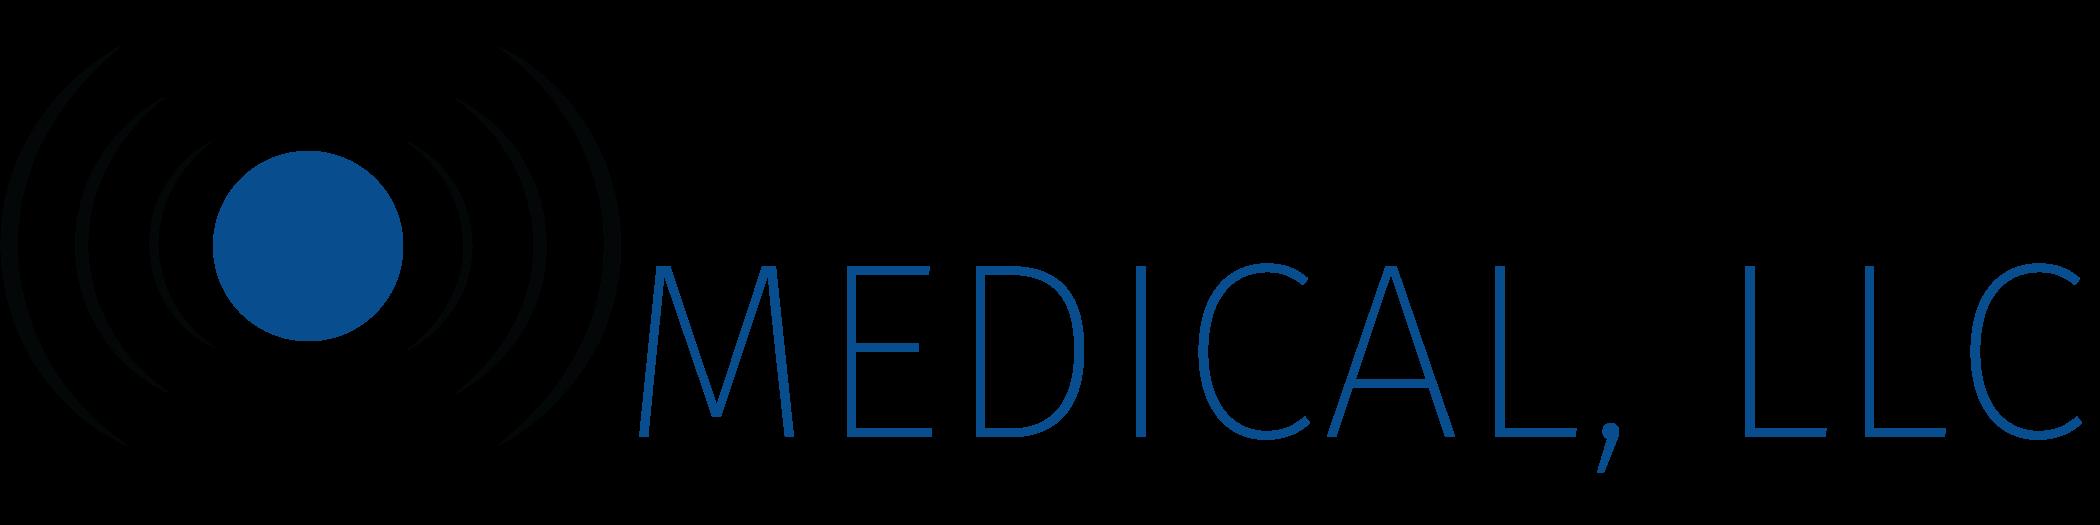 These Three Medical Inc.